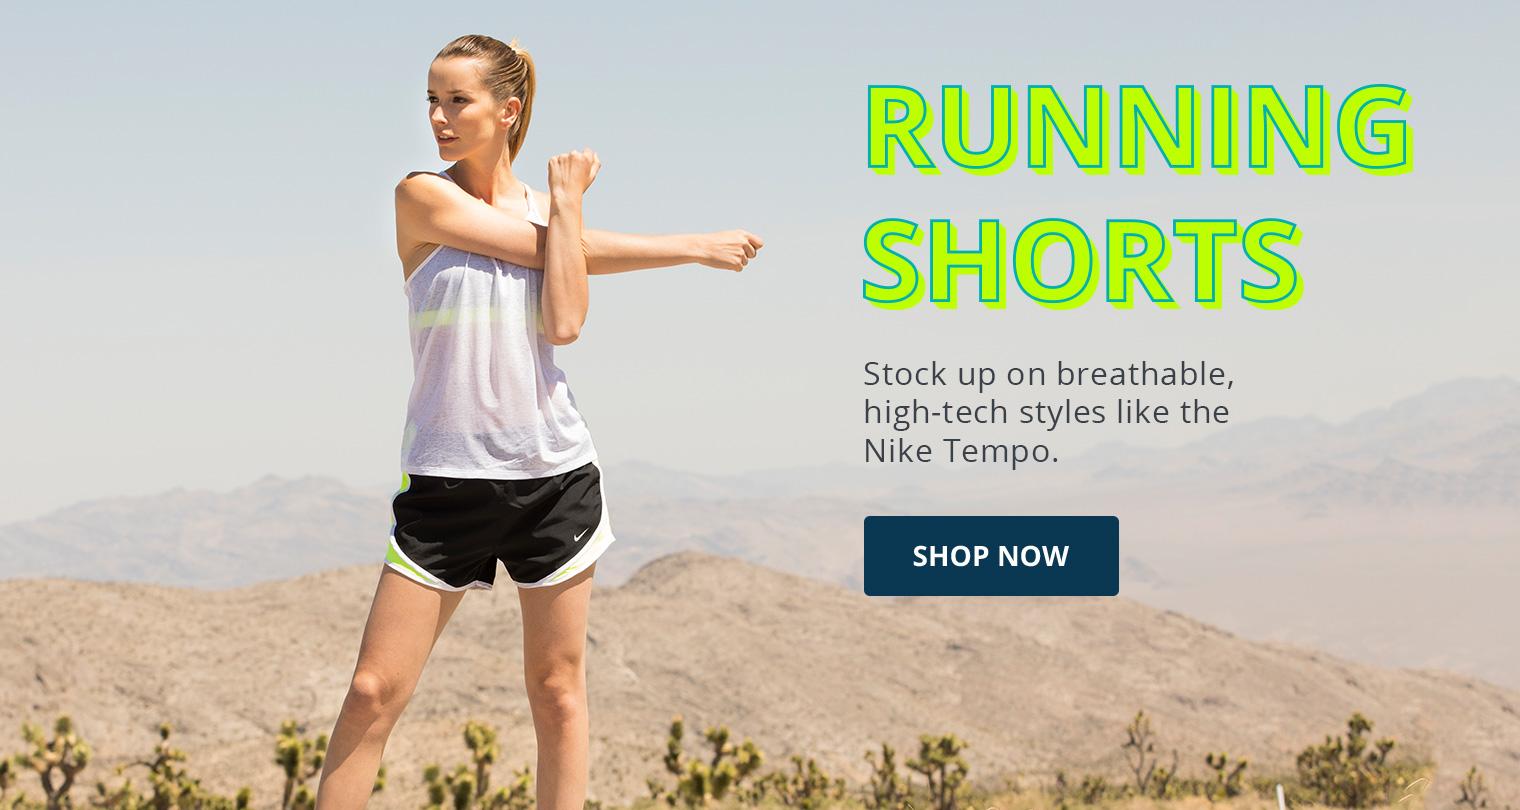 Running Shorts. Image of a woman wearing Nike running shorts